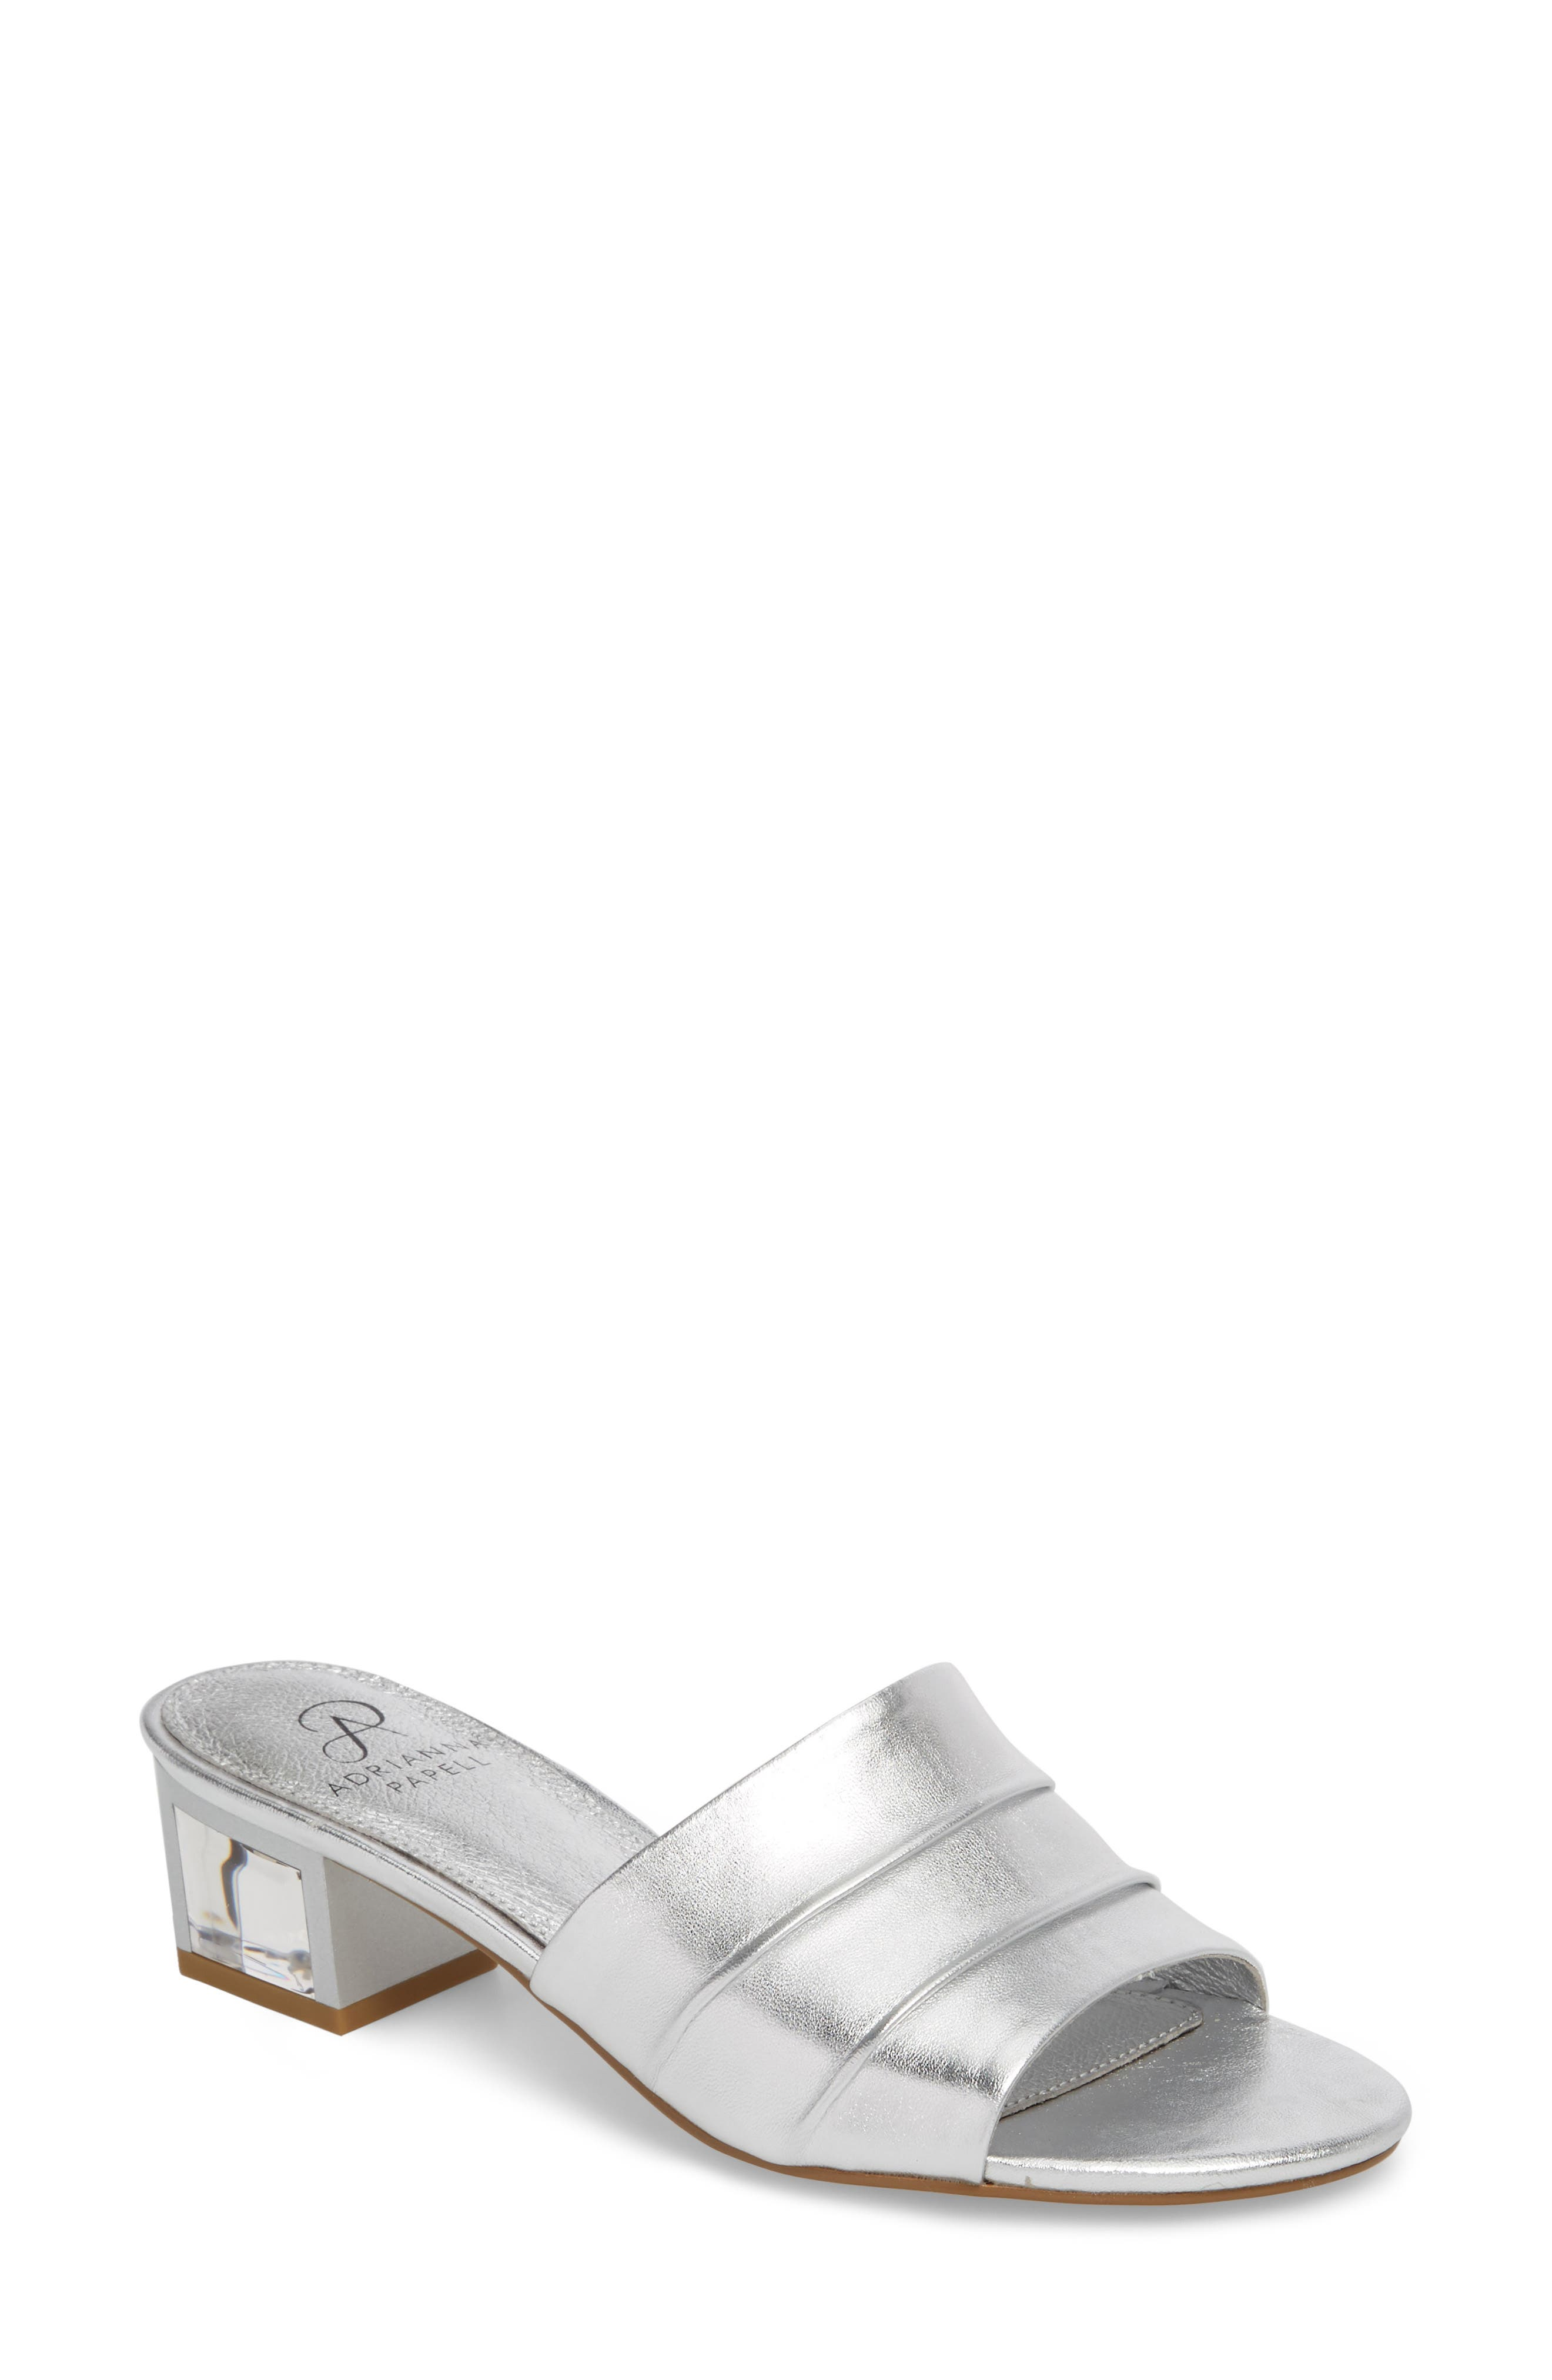 Tiana Block Heel Slide Sandal,                         Main,                         color, SILVER LEATHER